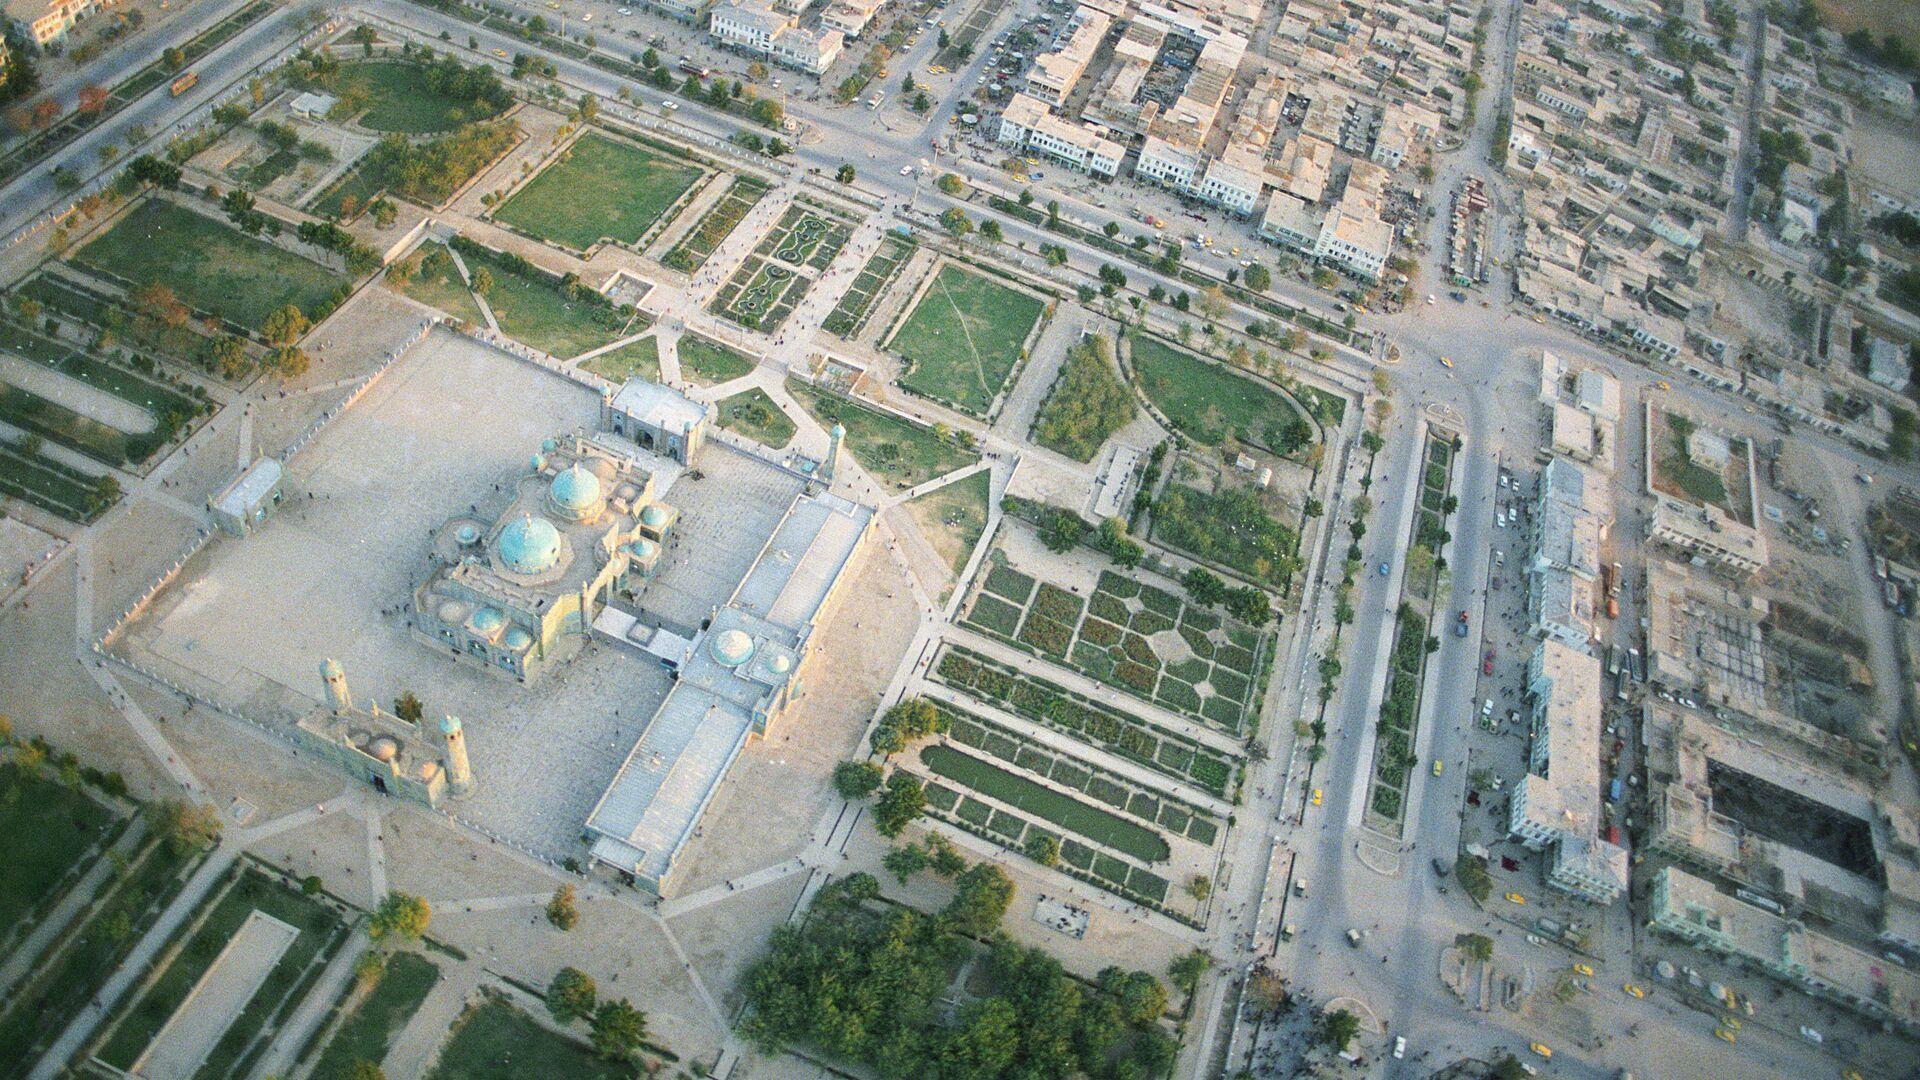 Вид с вертолета города Мазари-Шариф(Афганистан) - Sputnik Узбекистан, 1920, 14.07.2021